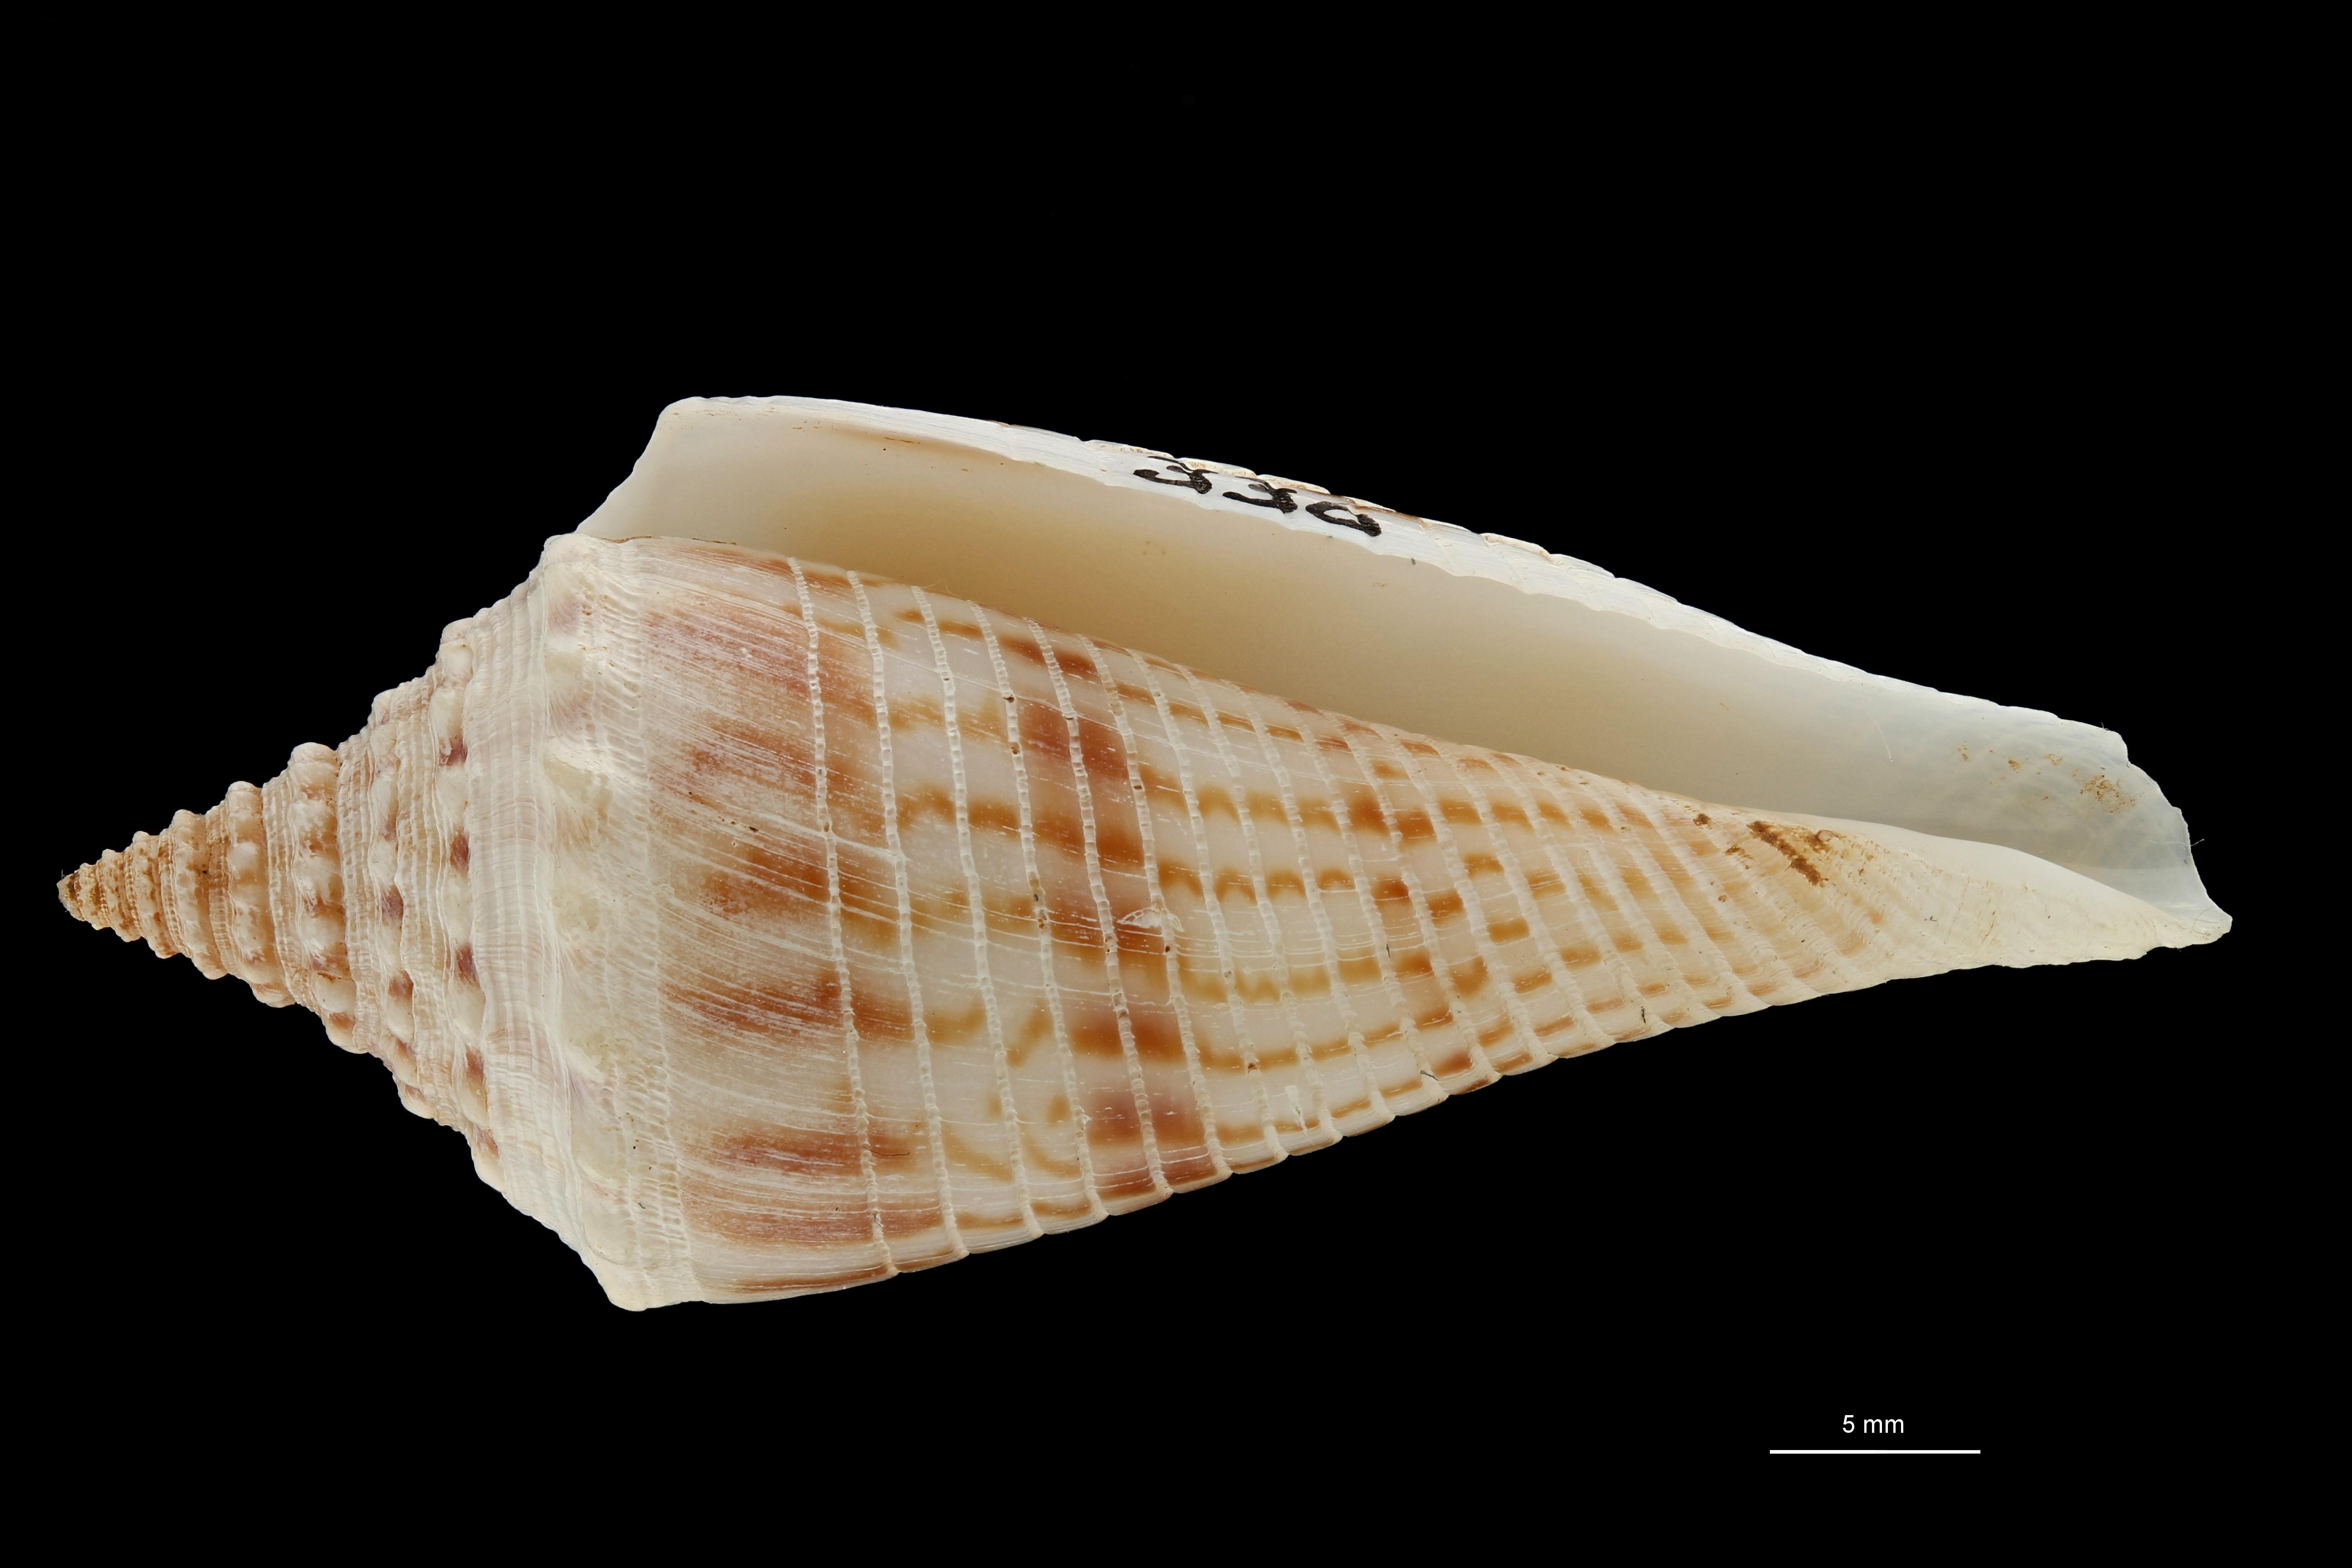 BE-RBINS-INV MT.3036 Conus orbignyi aratus Pt V ZS PMax Scaled.jpg